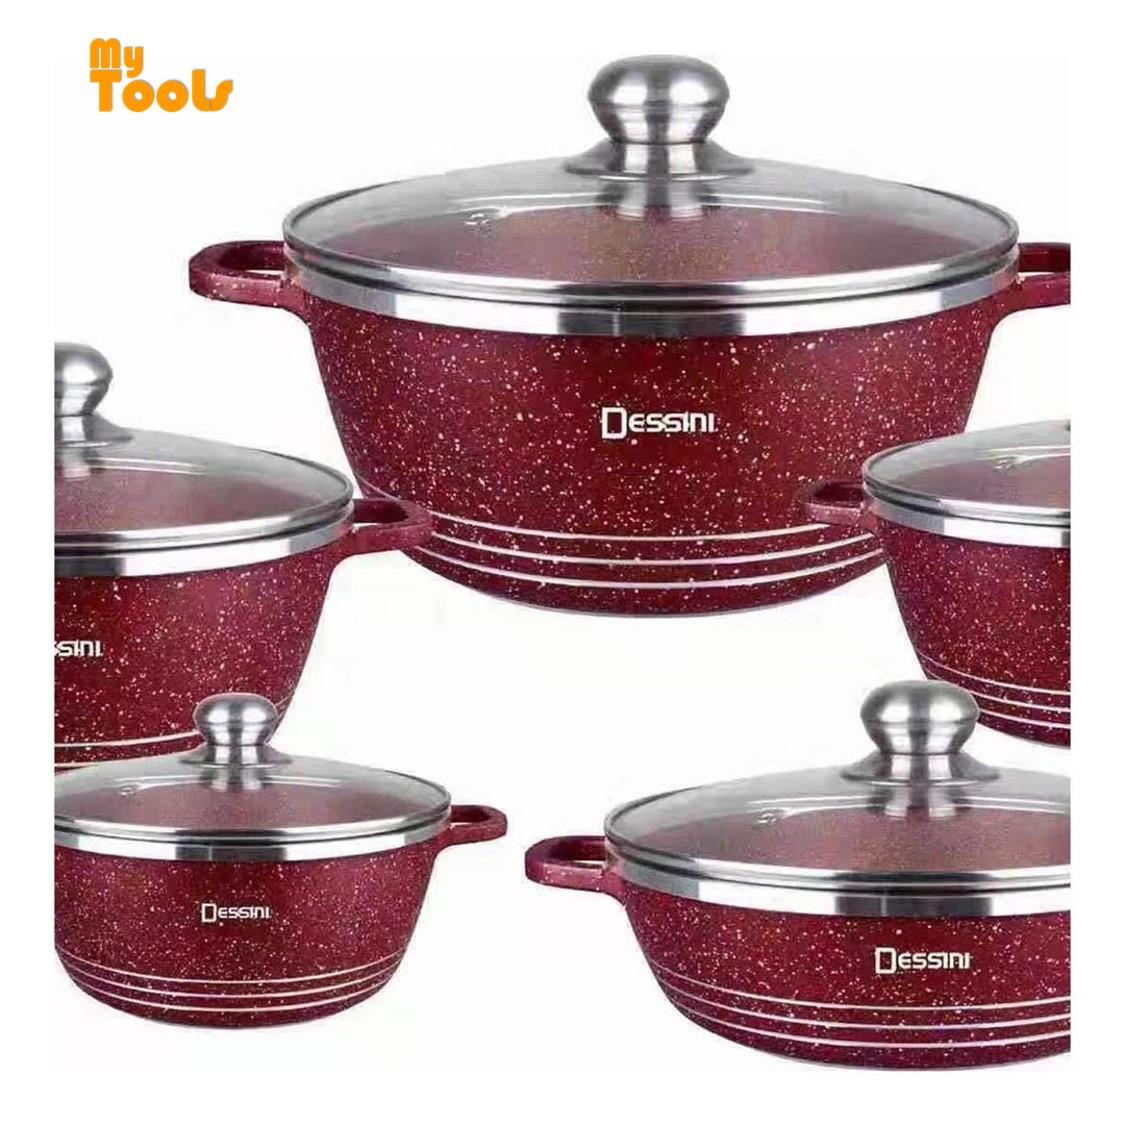 Mytools 10pcs Dessini Italy Cooking Set High Class Non Stick Ceramic Cookware Pot Full Glass Lid